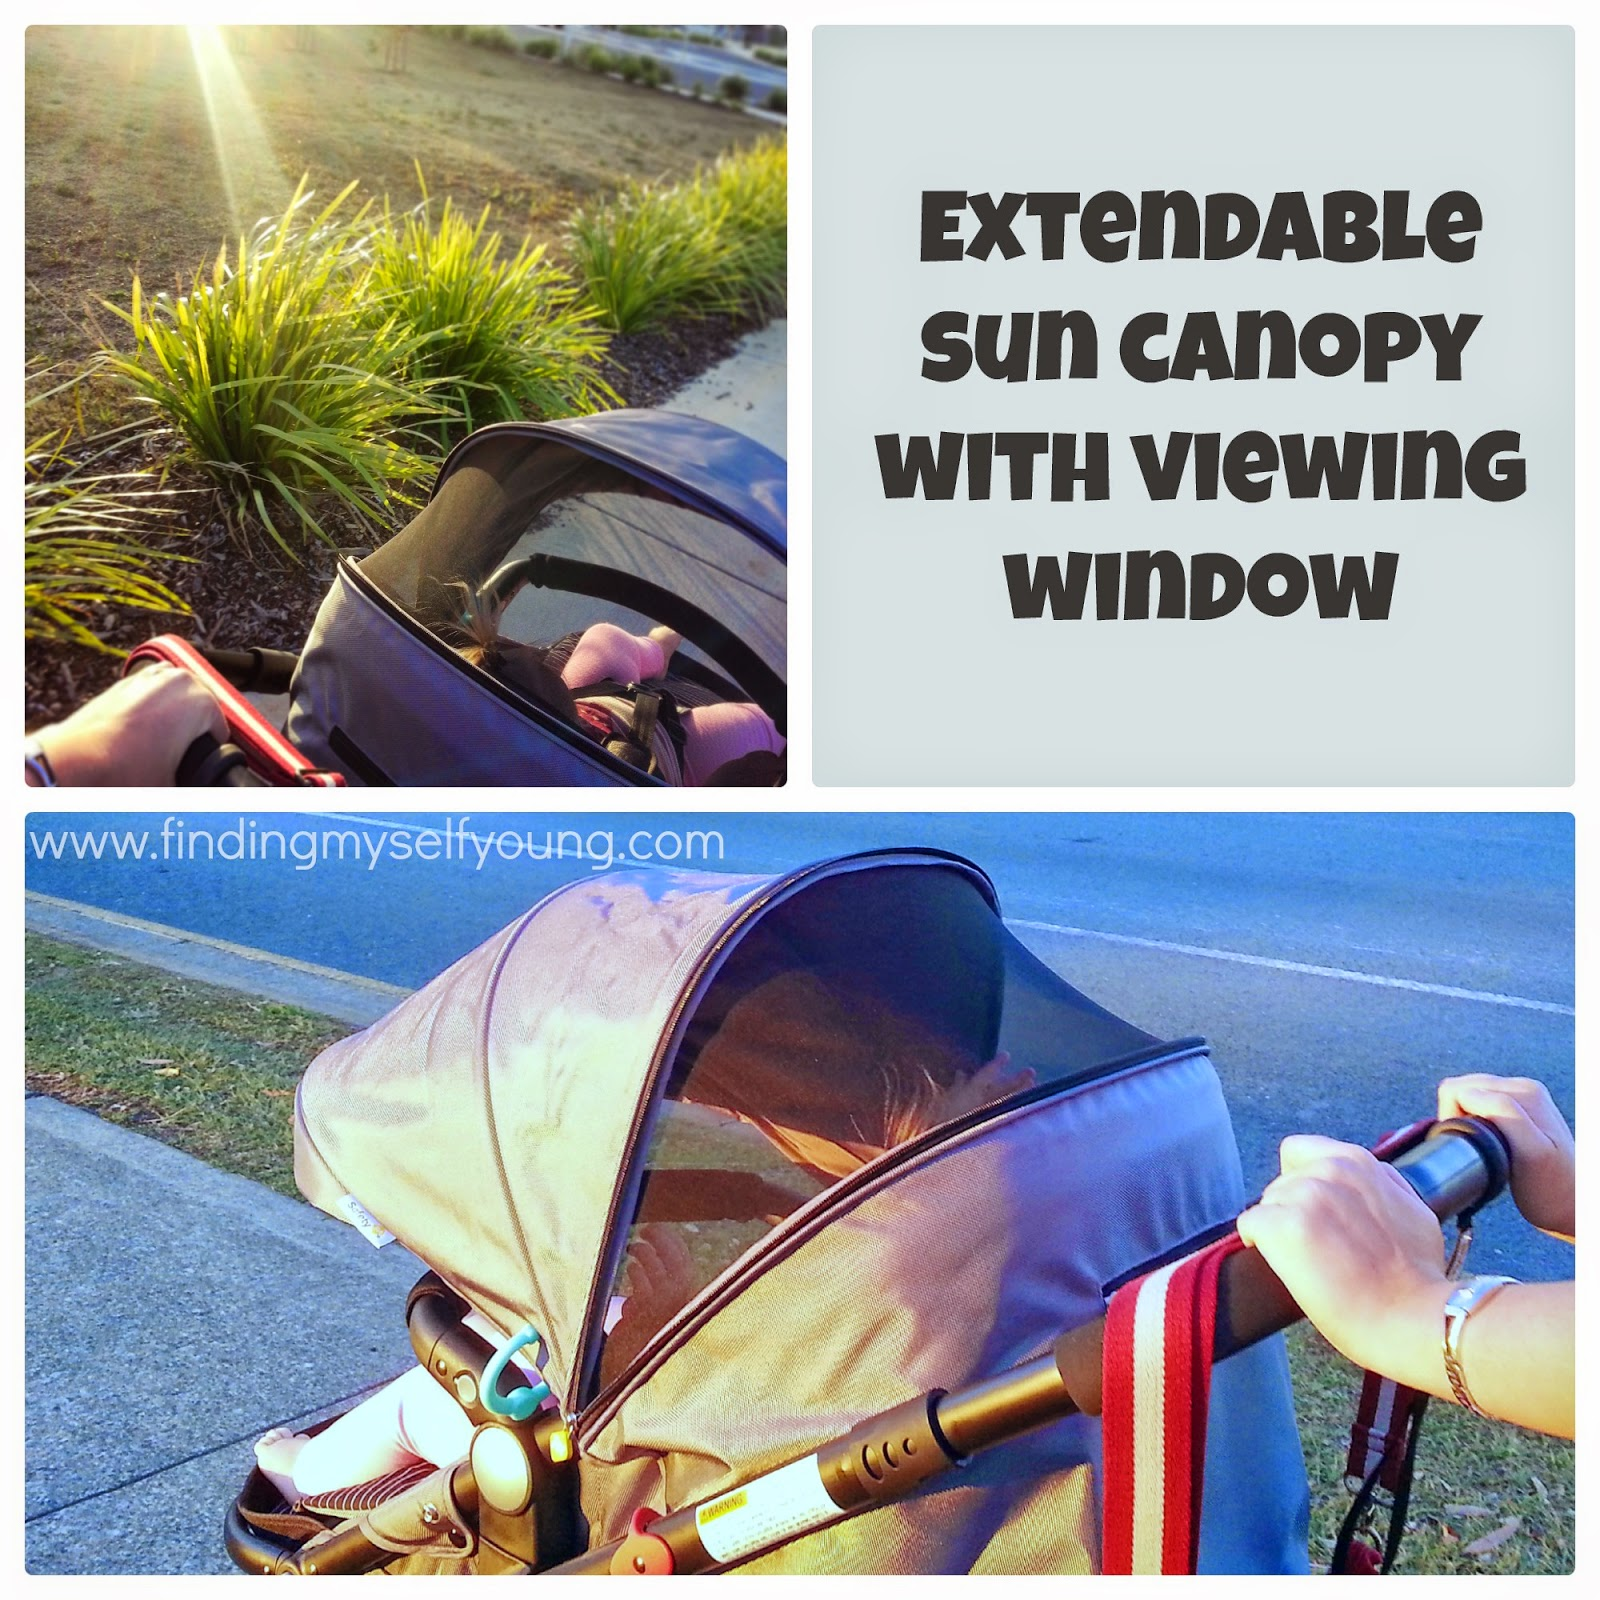 Safety 1st Wanderer 3 wheel pram extendible sun canopy